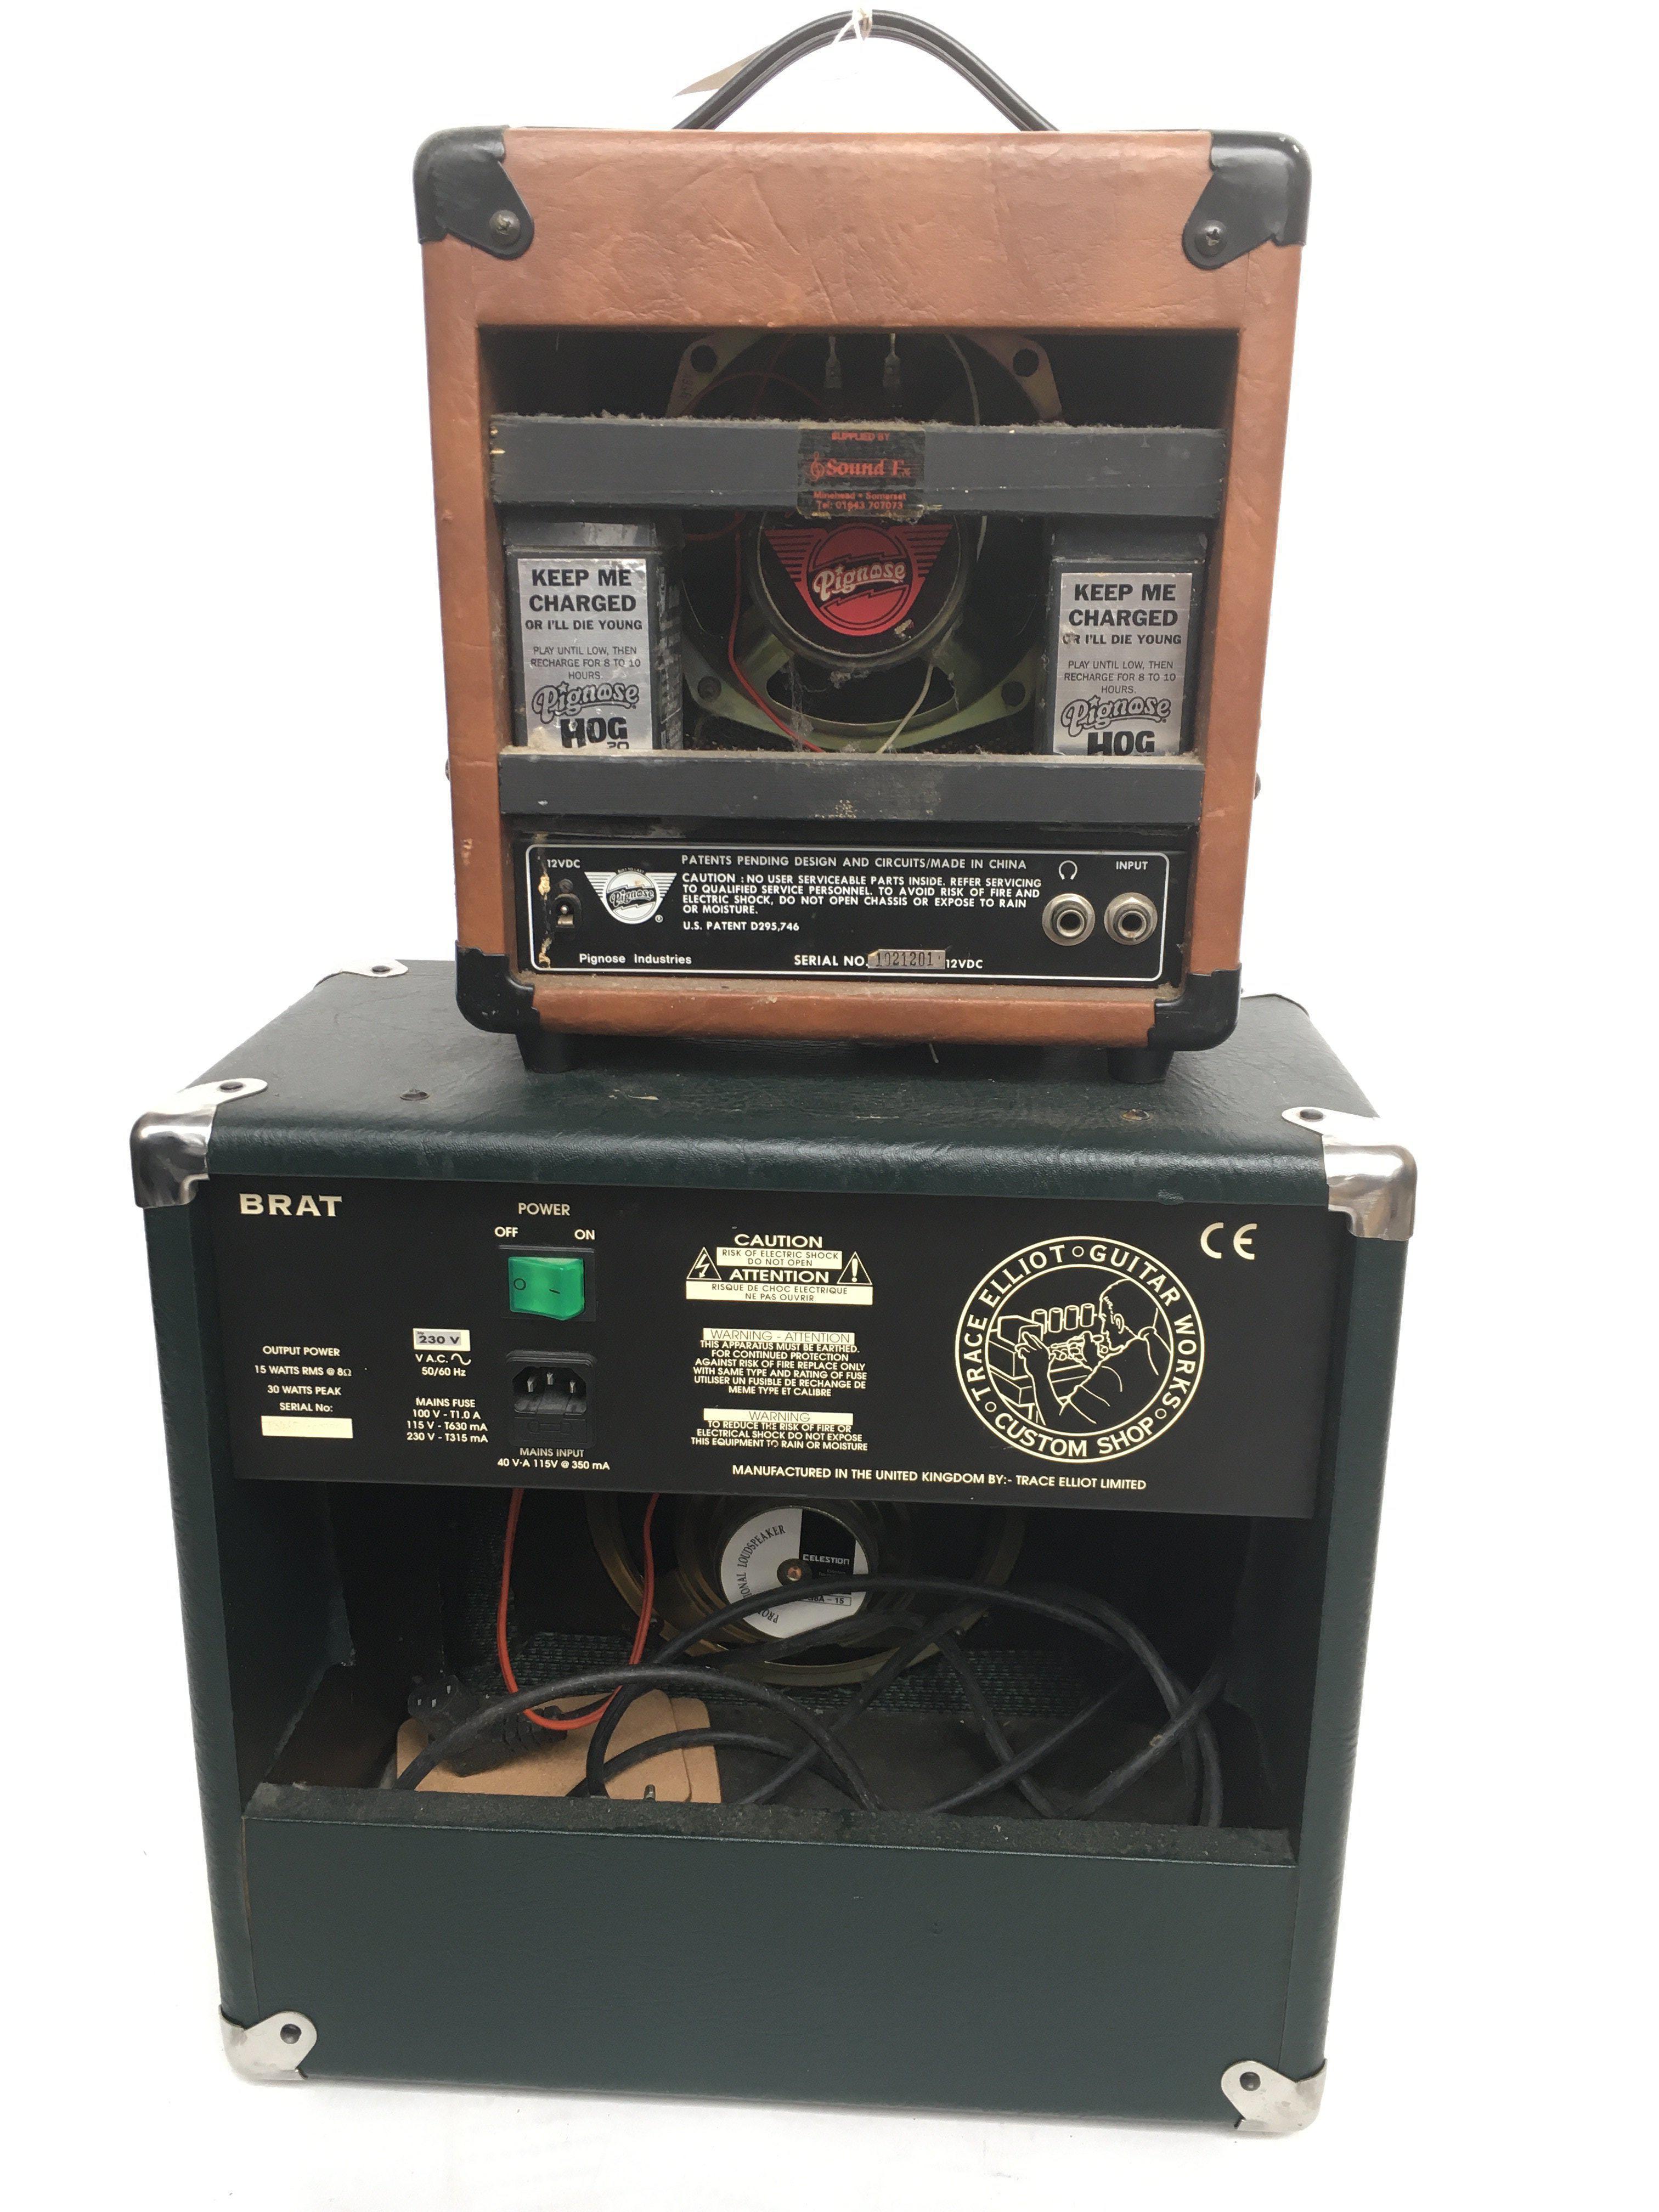 A Pignose Hog 20 guitar amplifier together with a - Image 2 of 2